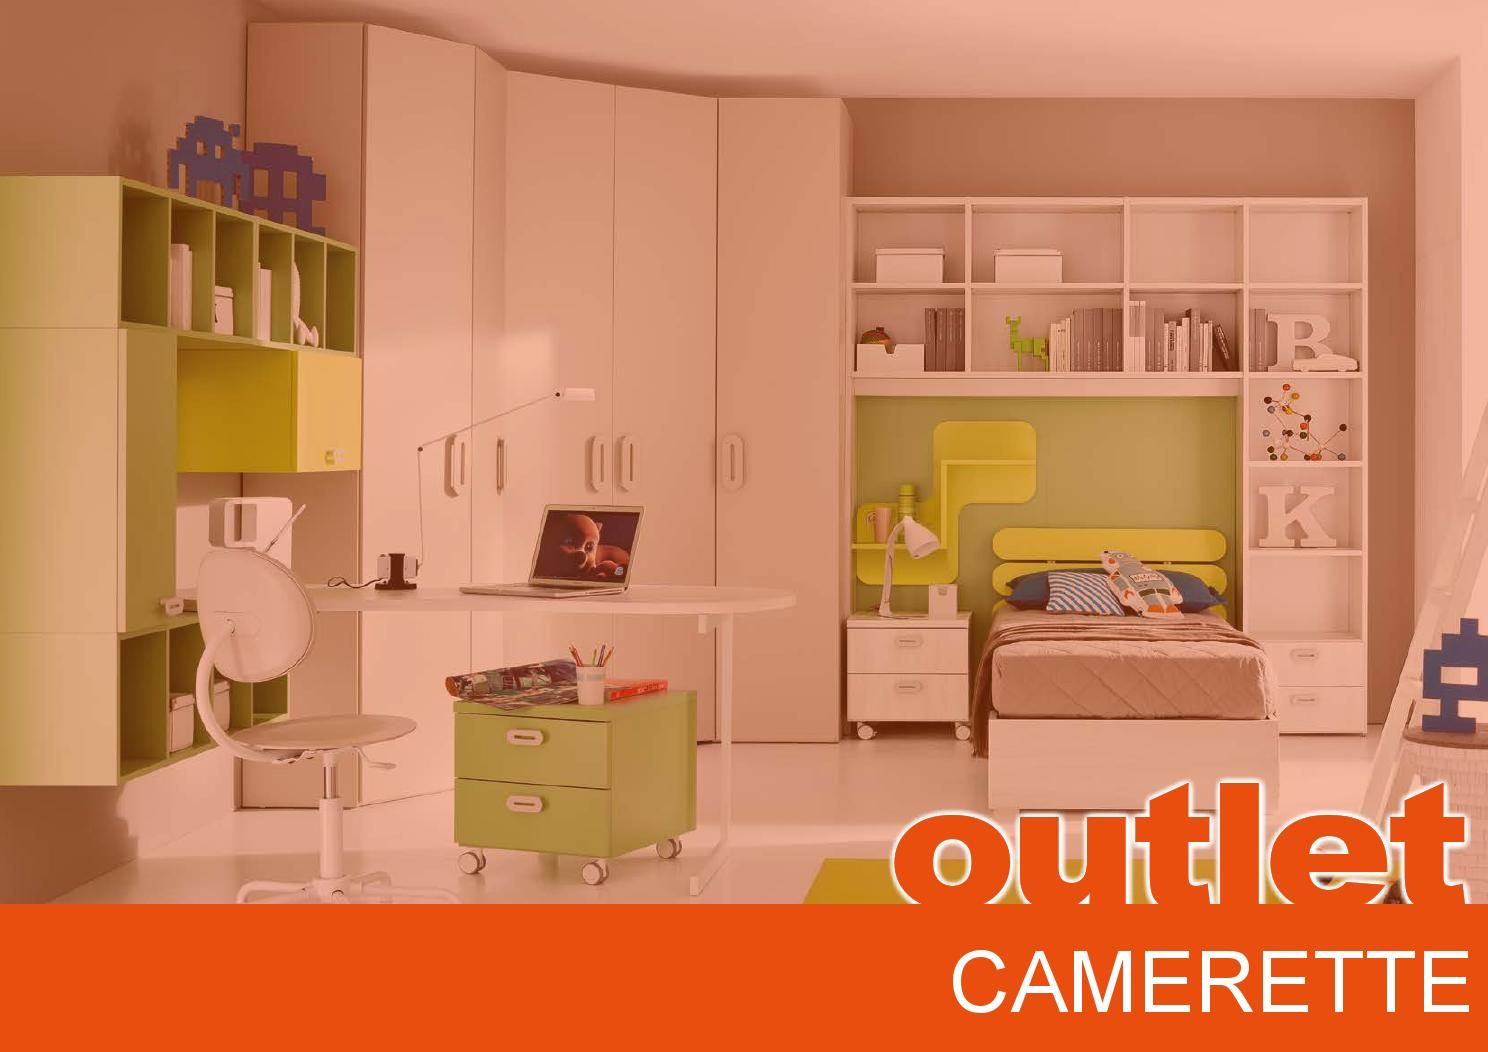 Arredissima camerette ~ Beautiful asta mobili camerette ideas bakeroffroad.us